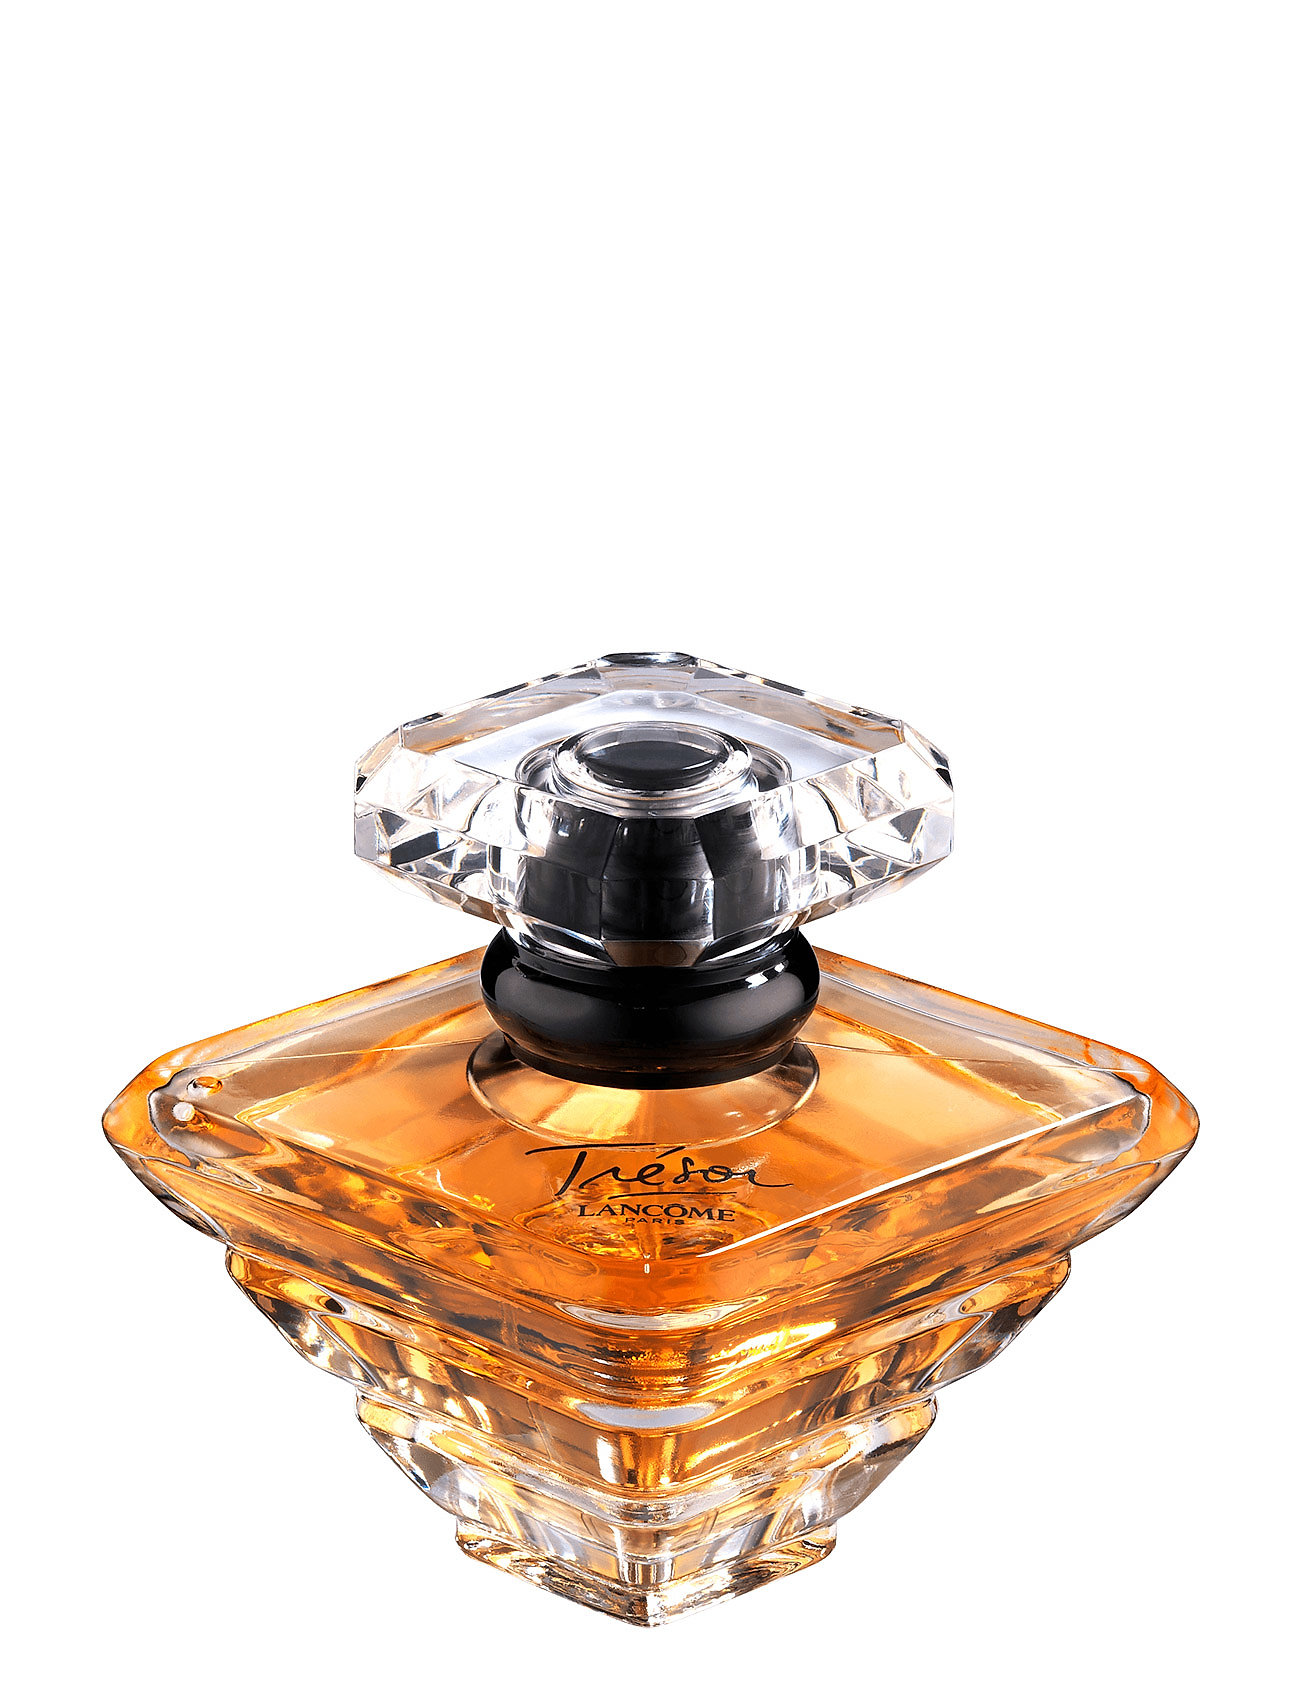 lancã´me Trã©sor eau de parfum 50 ml fra boozt.com dk